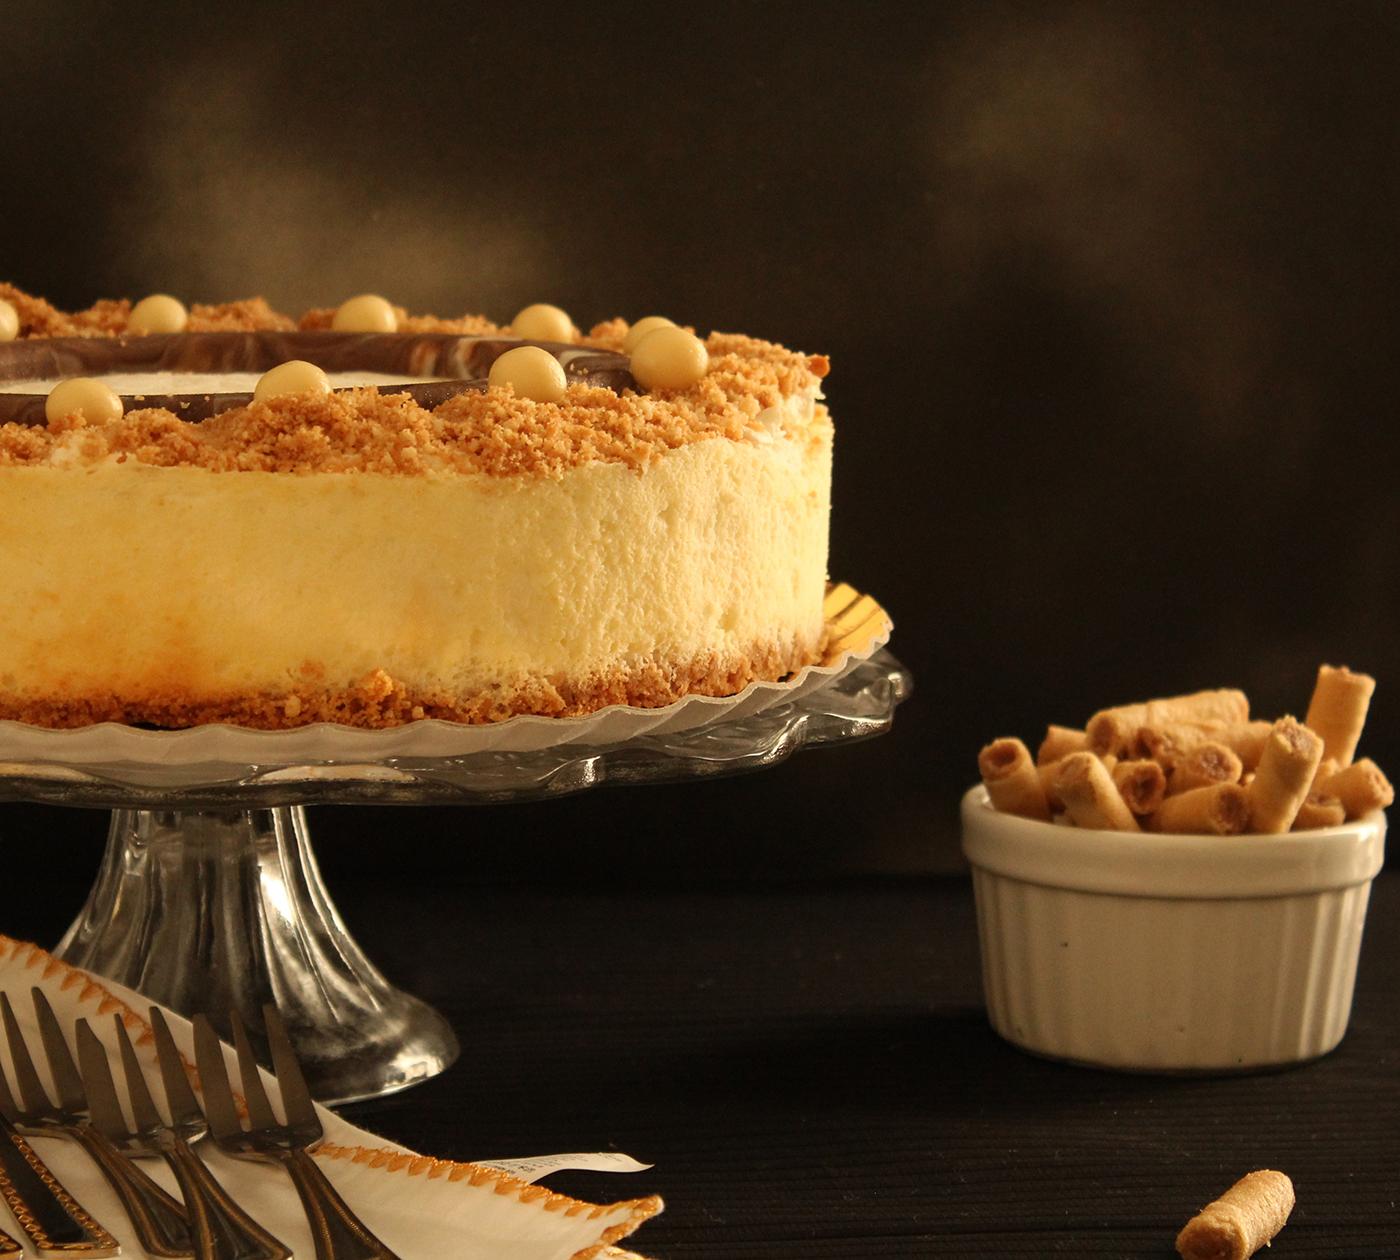 IMG 8253 - עוגת גבינה גבוהה וטעימה